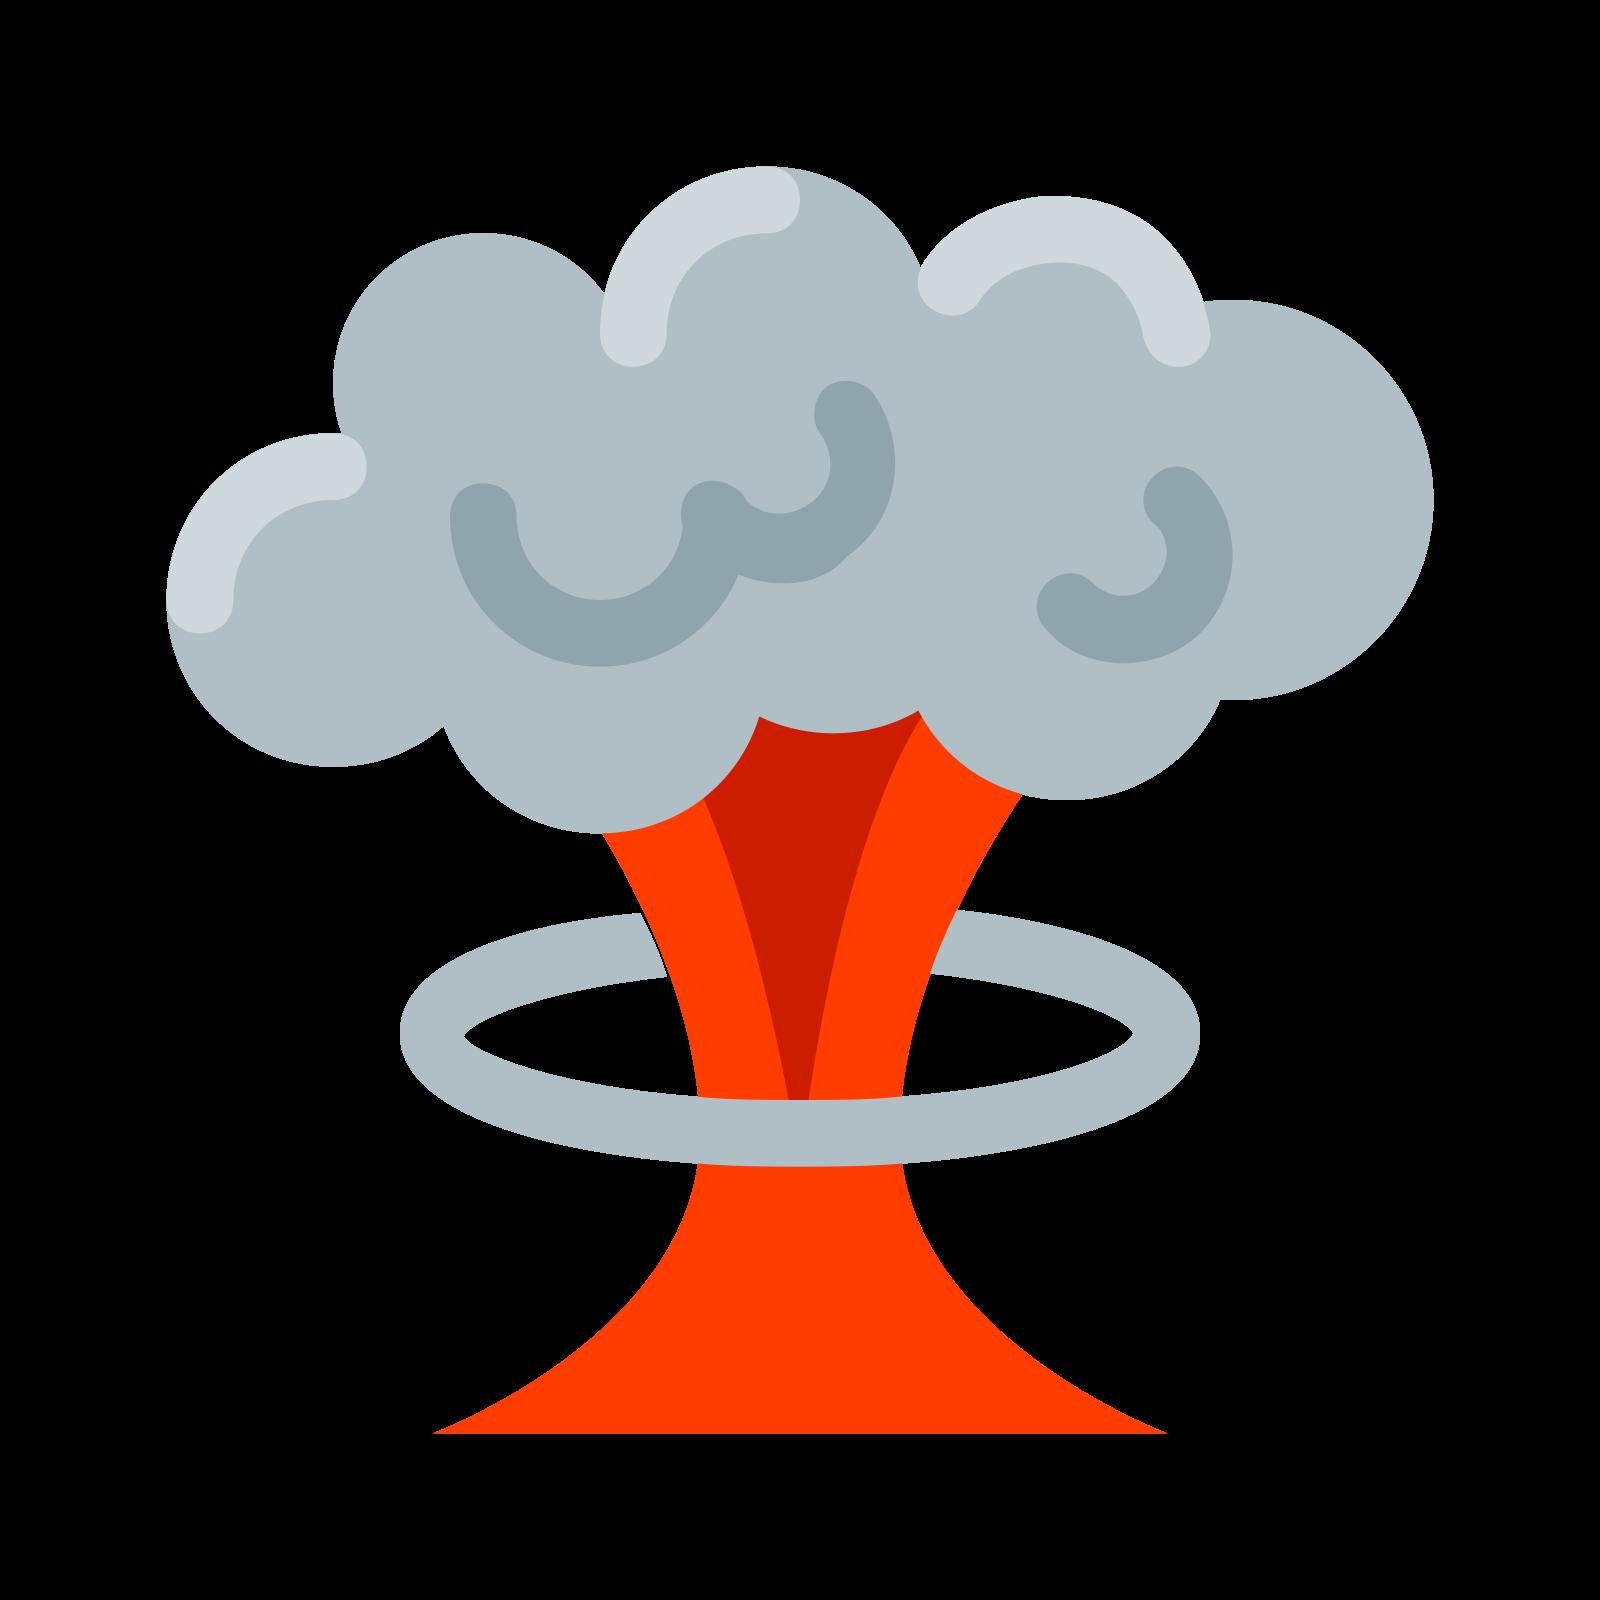 Grzyb atomowy icon